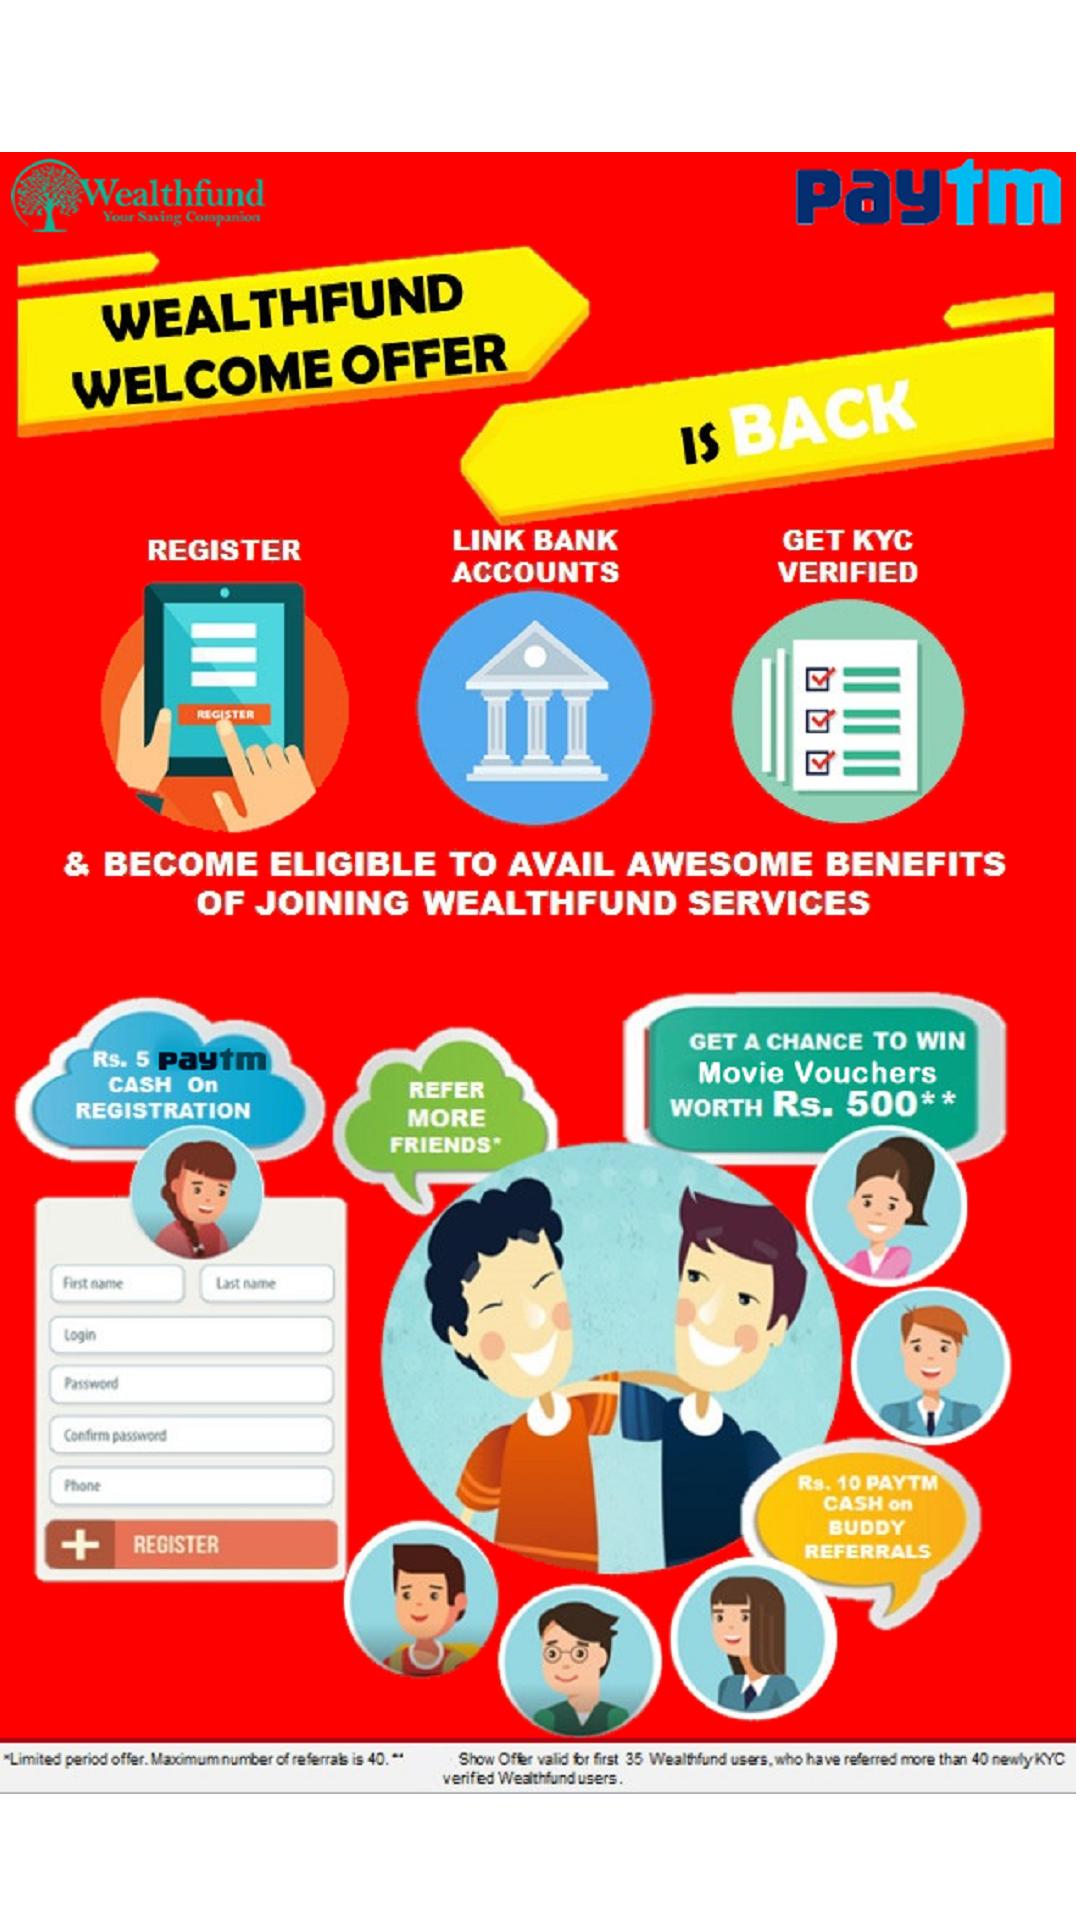 Wealthfund_loot_Paytm_Cash_Signup_Refer_Earn